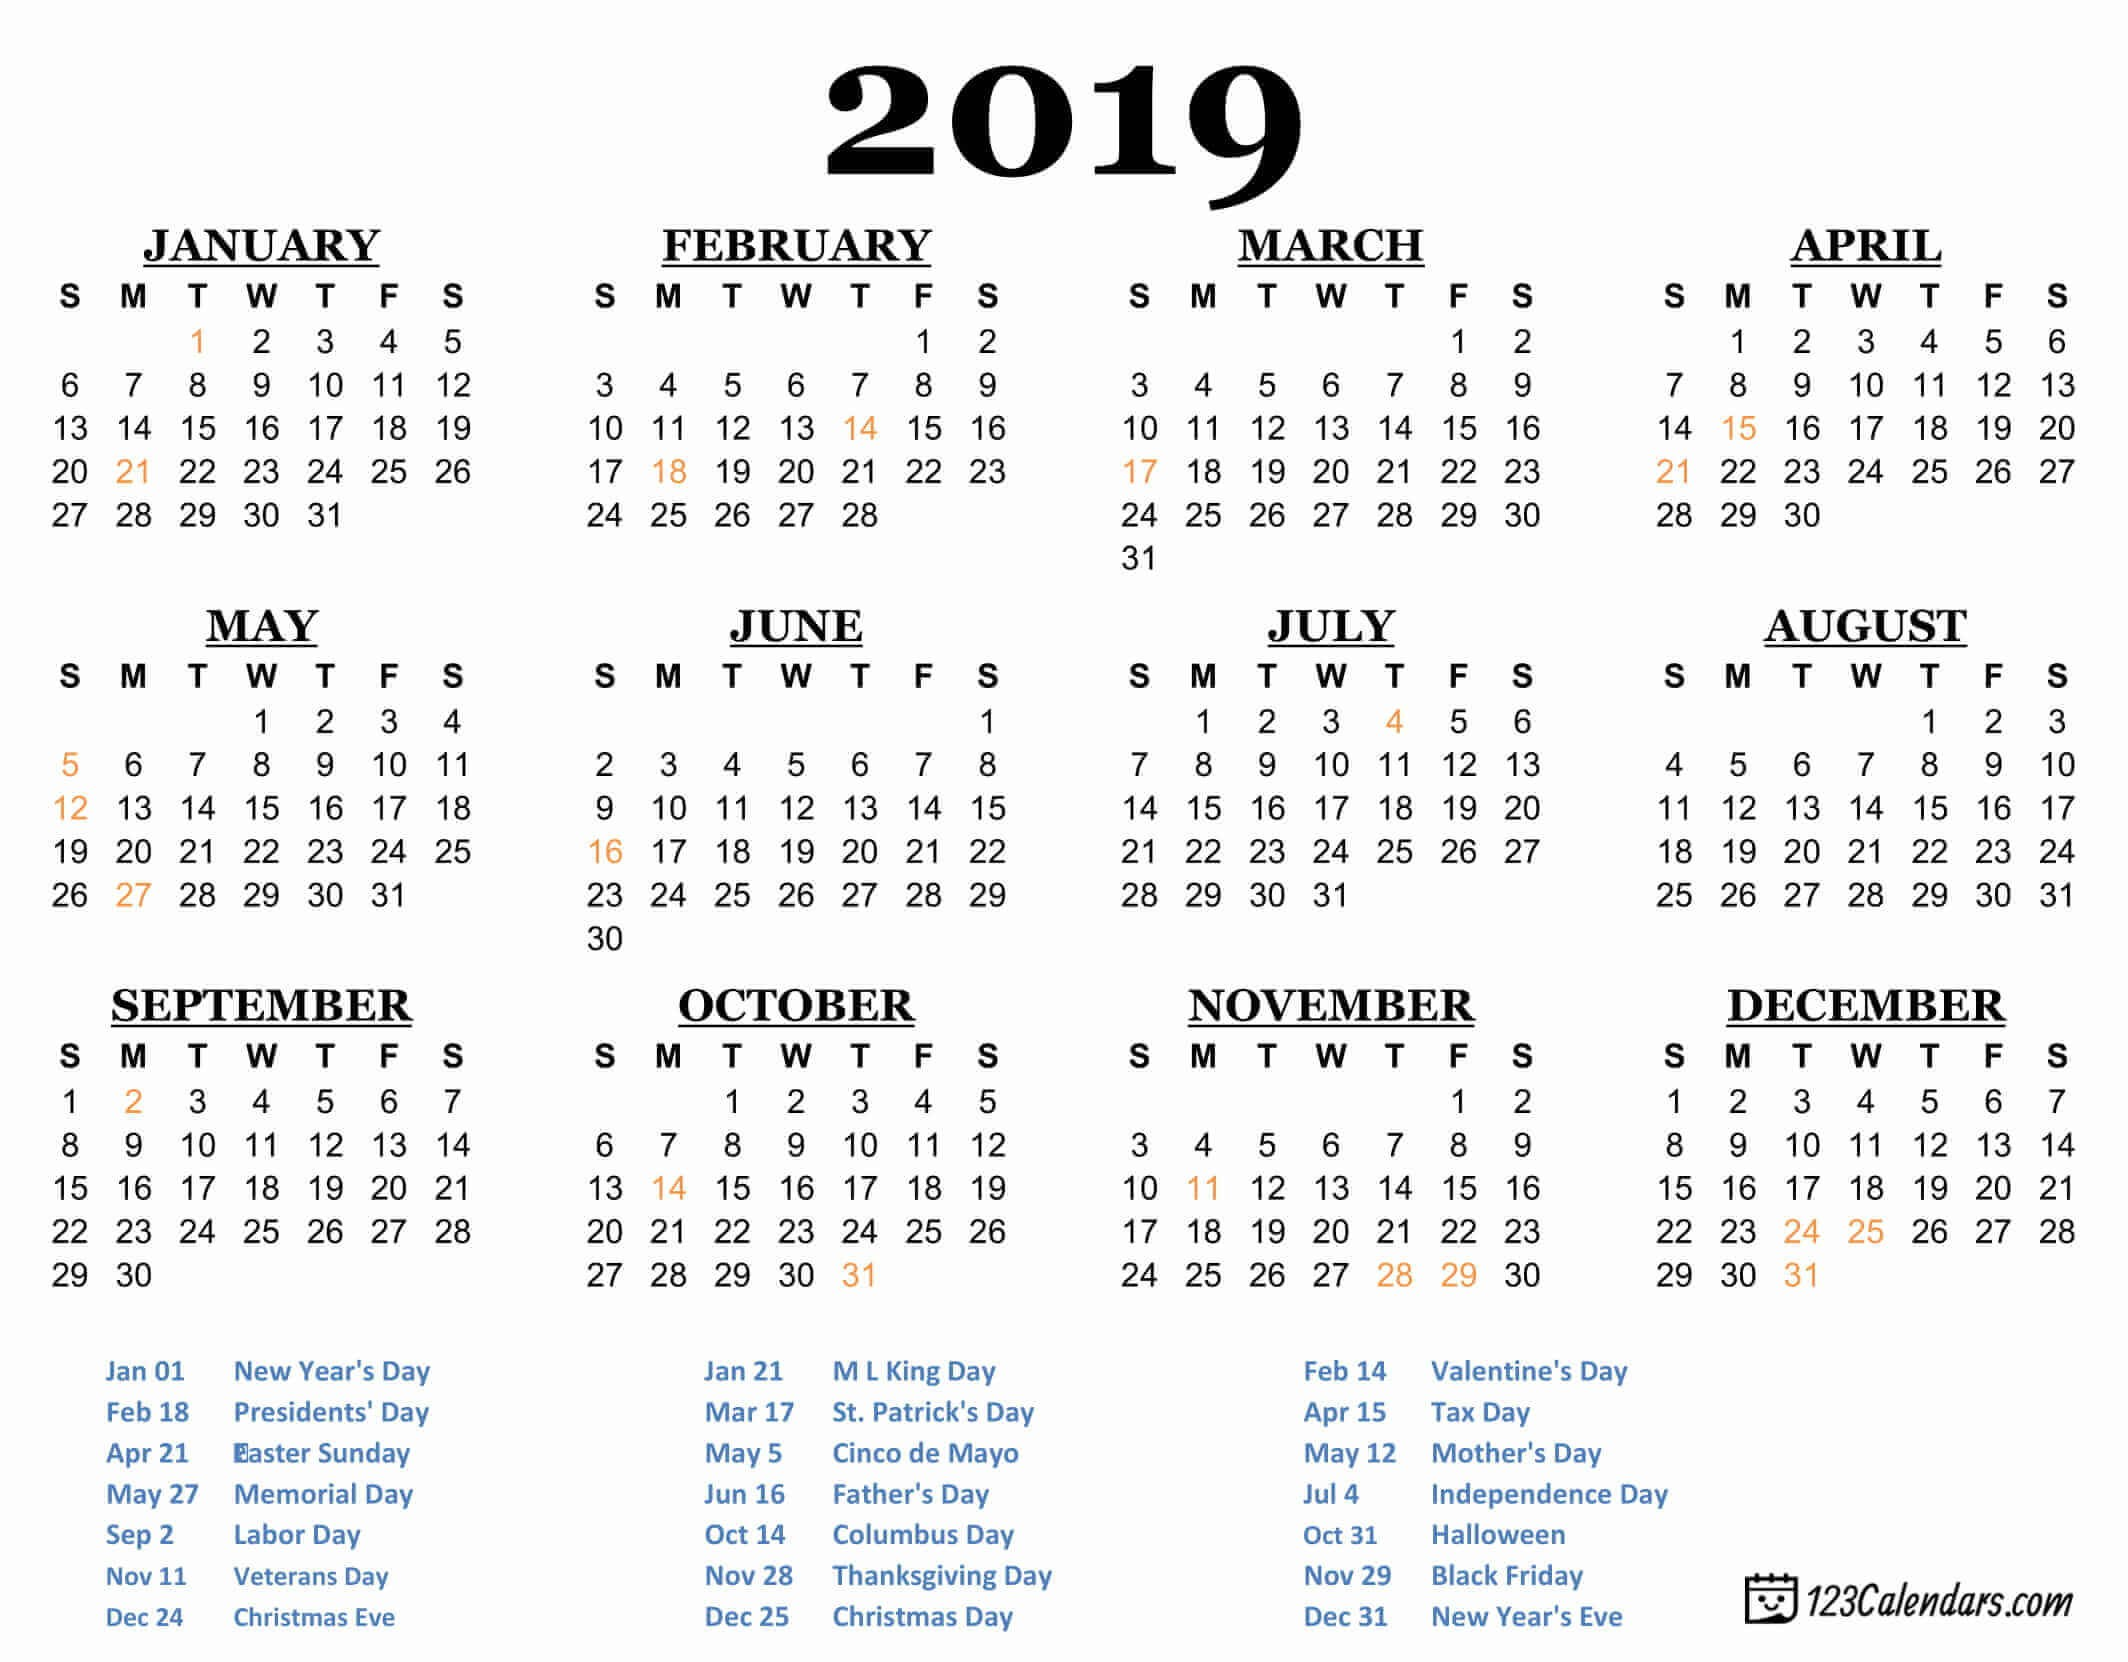 Printable 2019 Calendar 2019 Printable Calendar 123calendars